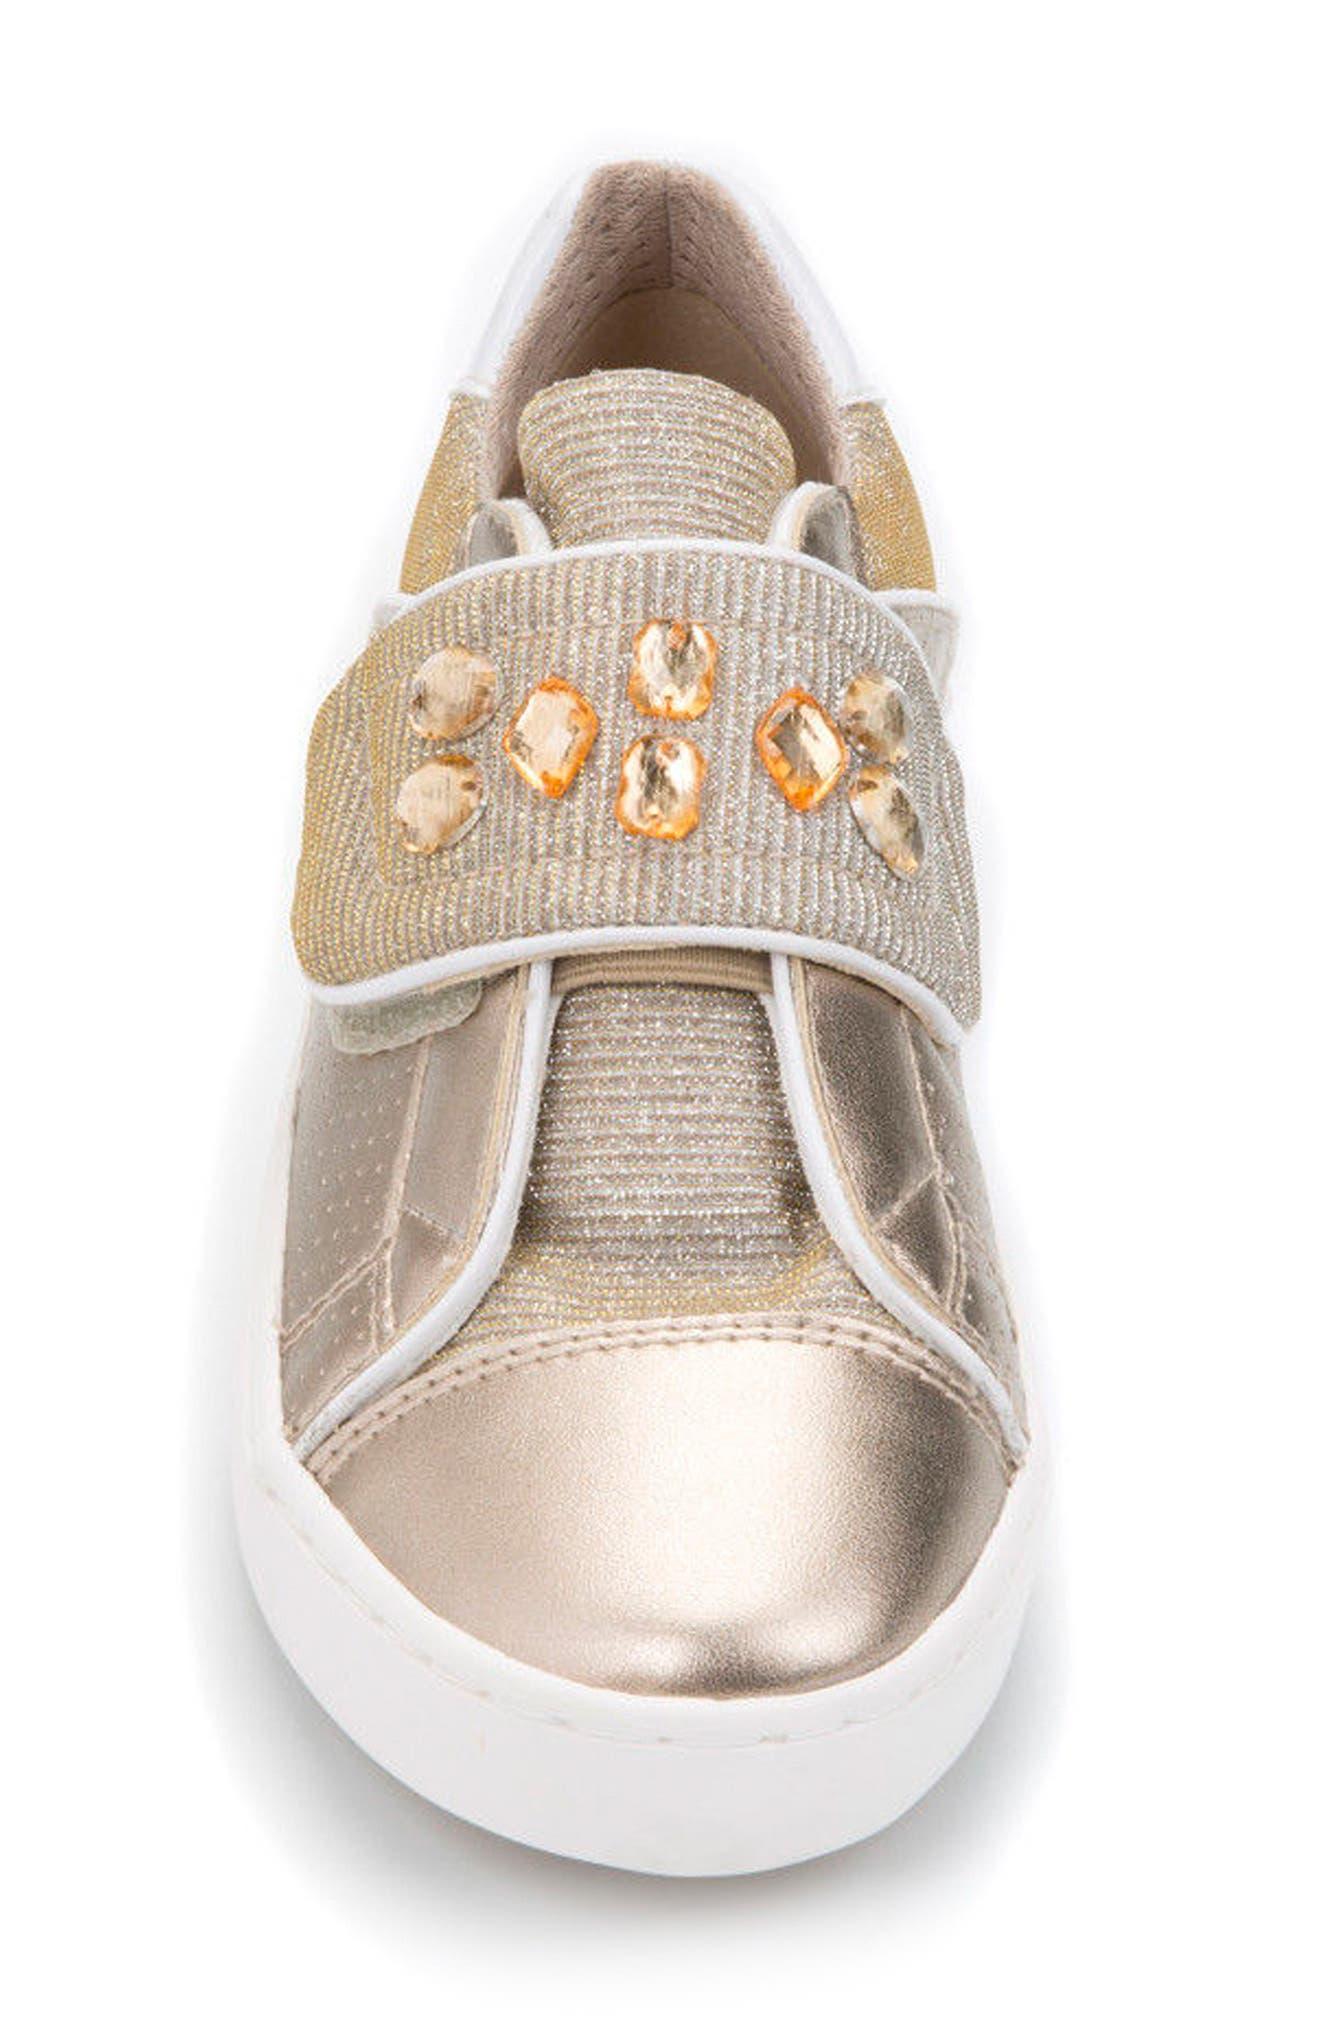 Kilwi Metallic Embellished Sneaker,                             Alternate thumbnail 4, color,                             GOLD